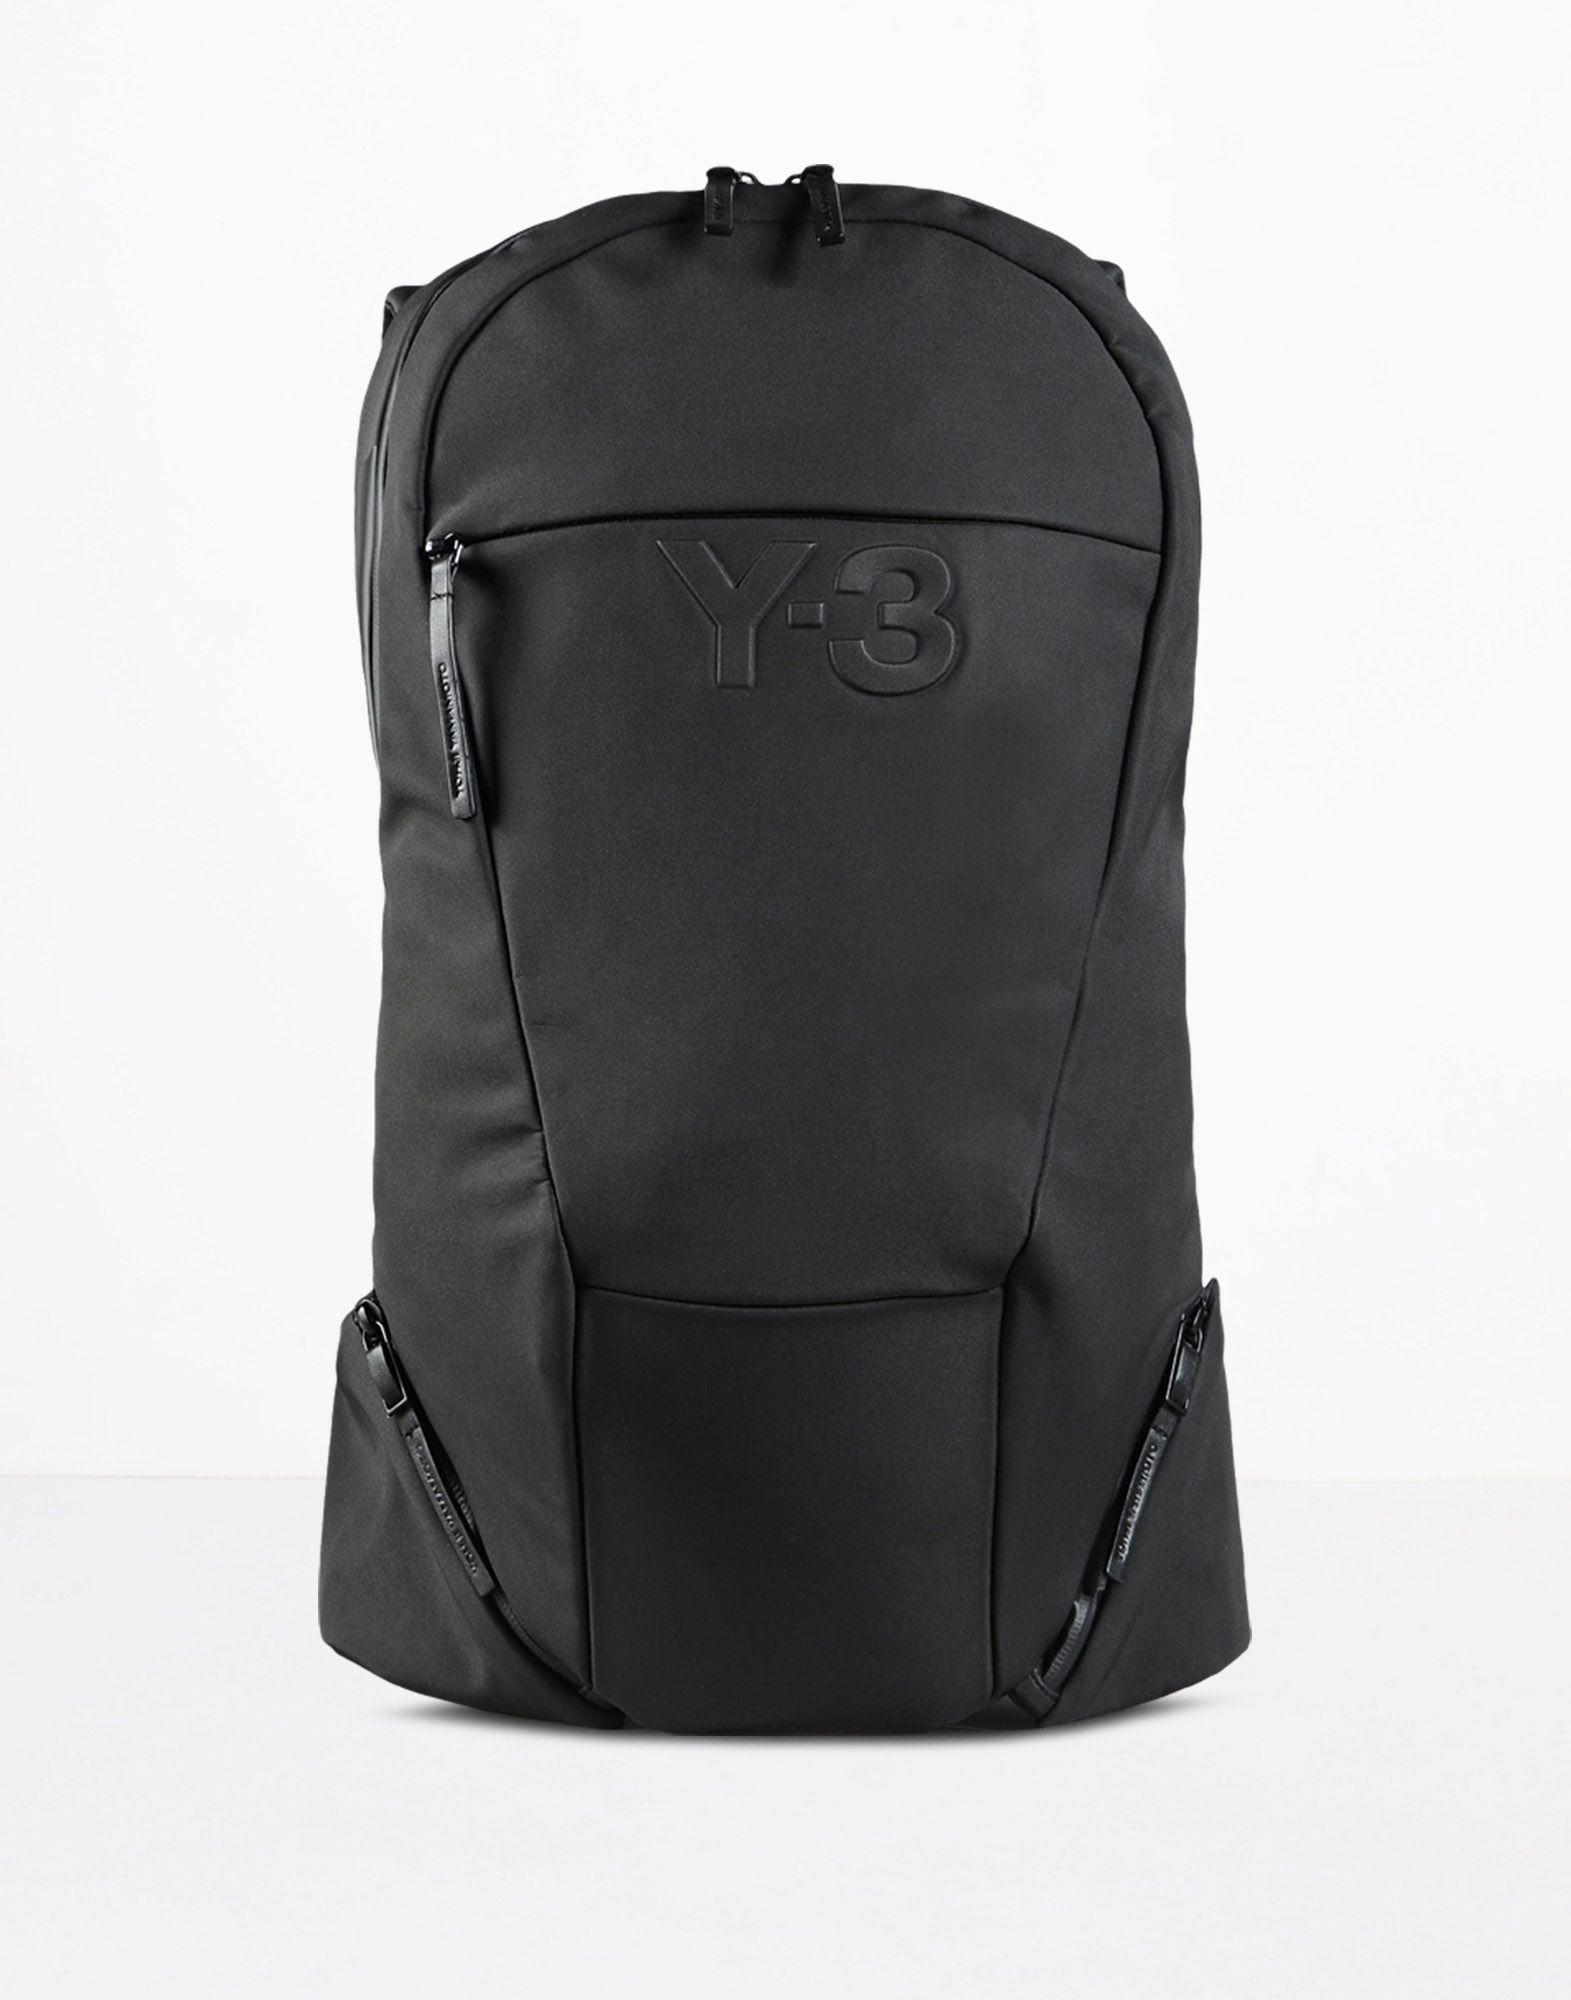 ... Y-3 Y-3 VEST BACKPACK LARGE Backpack E f ... 750210a0e3245